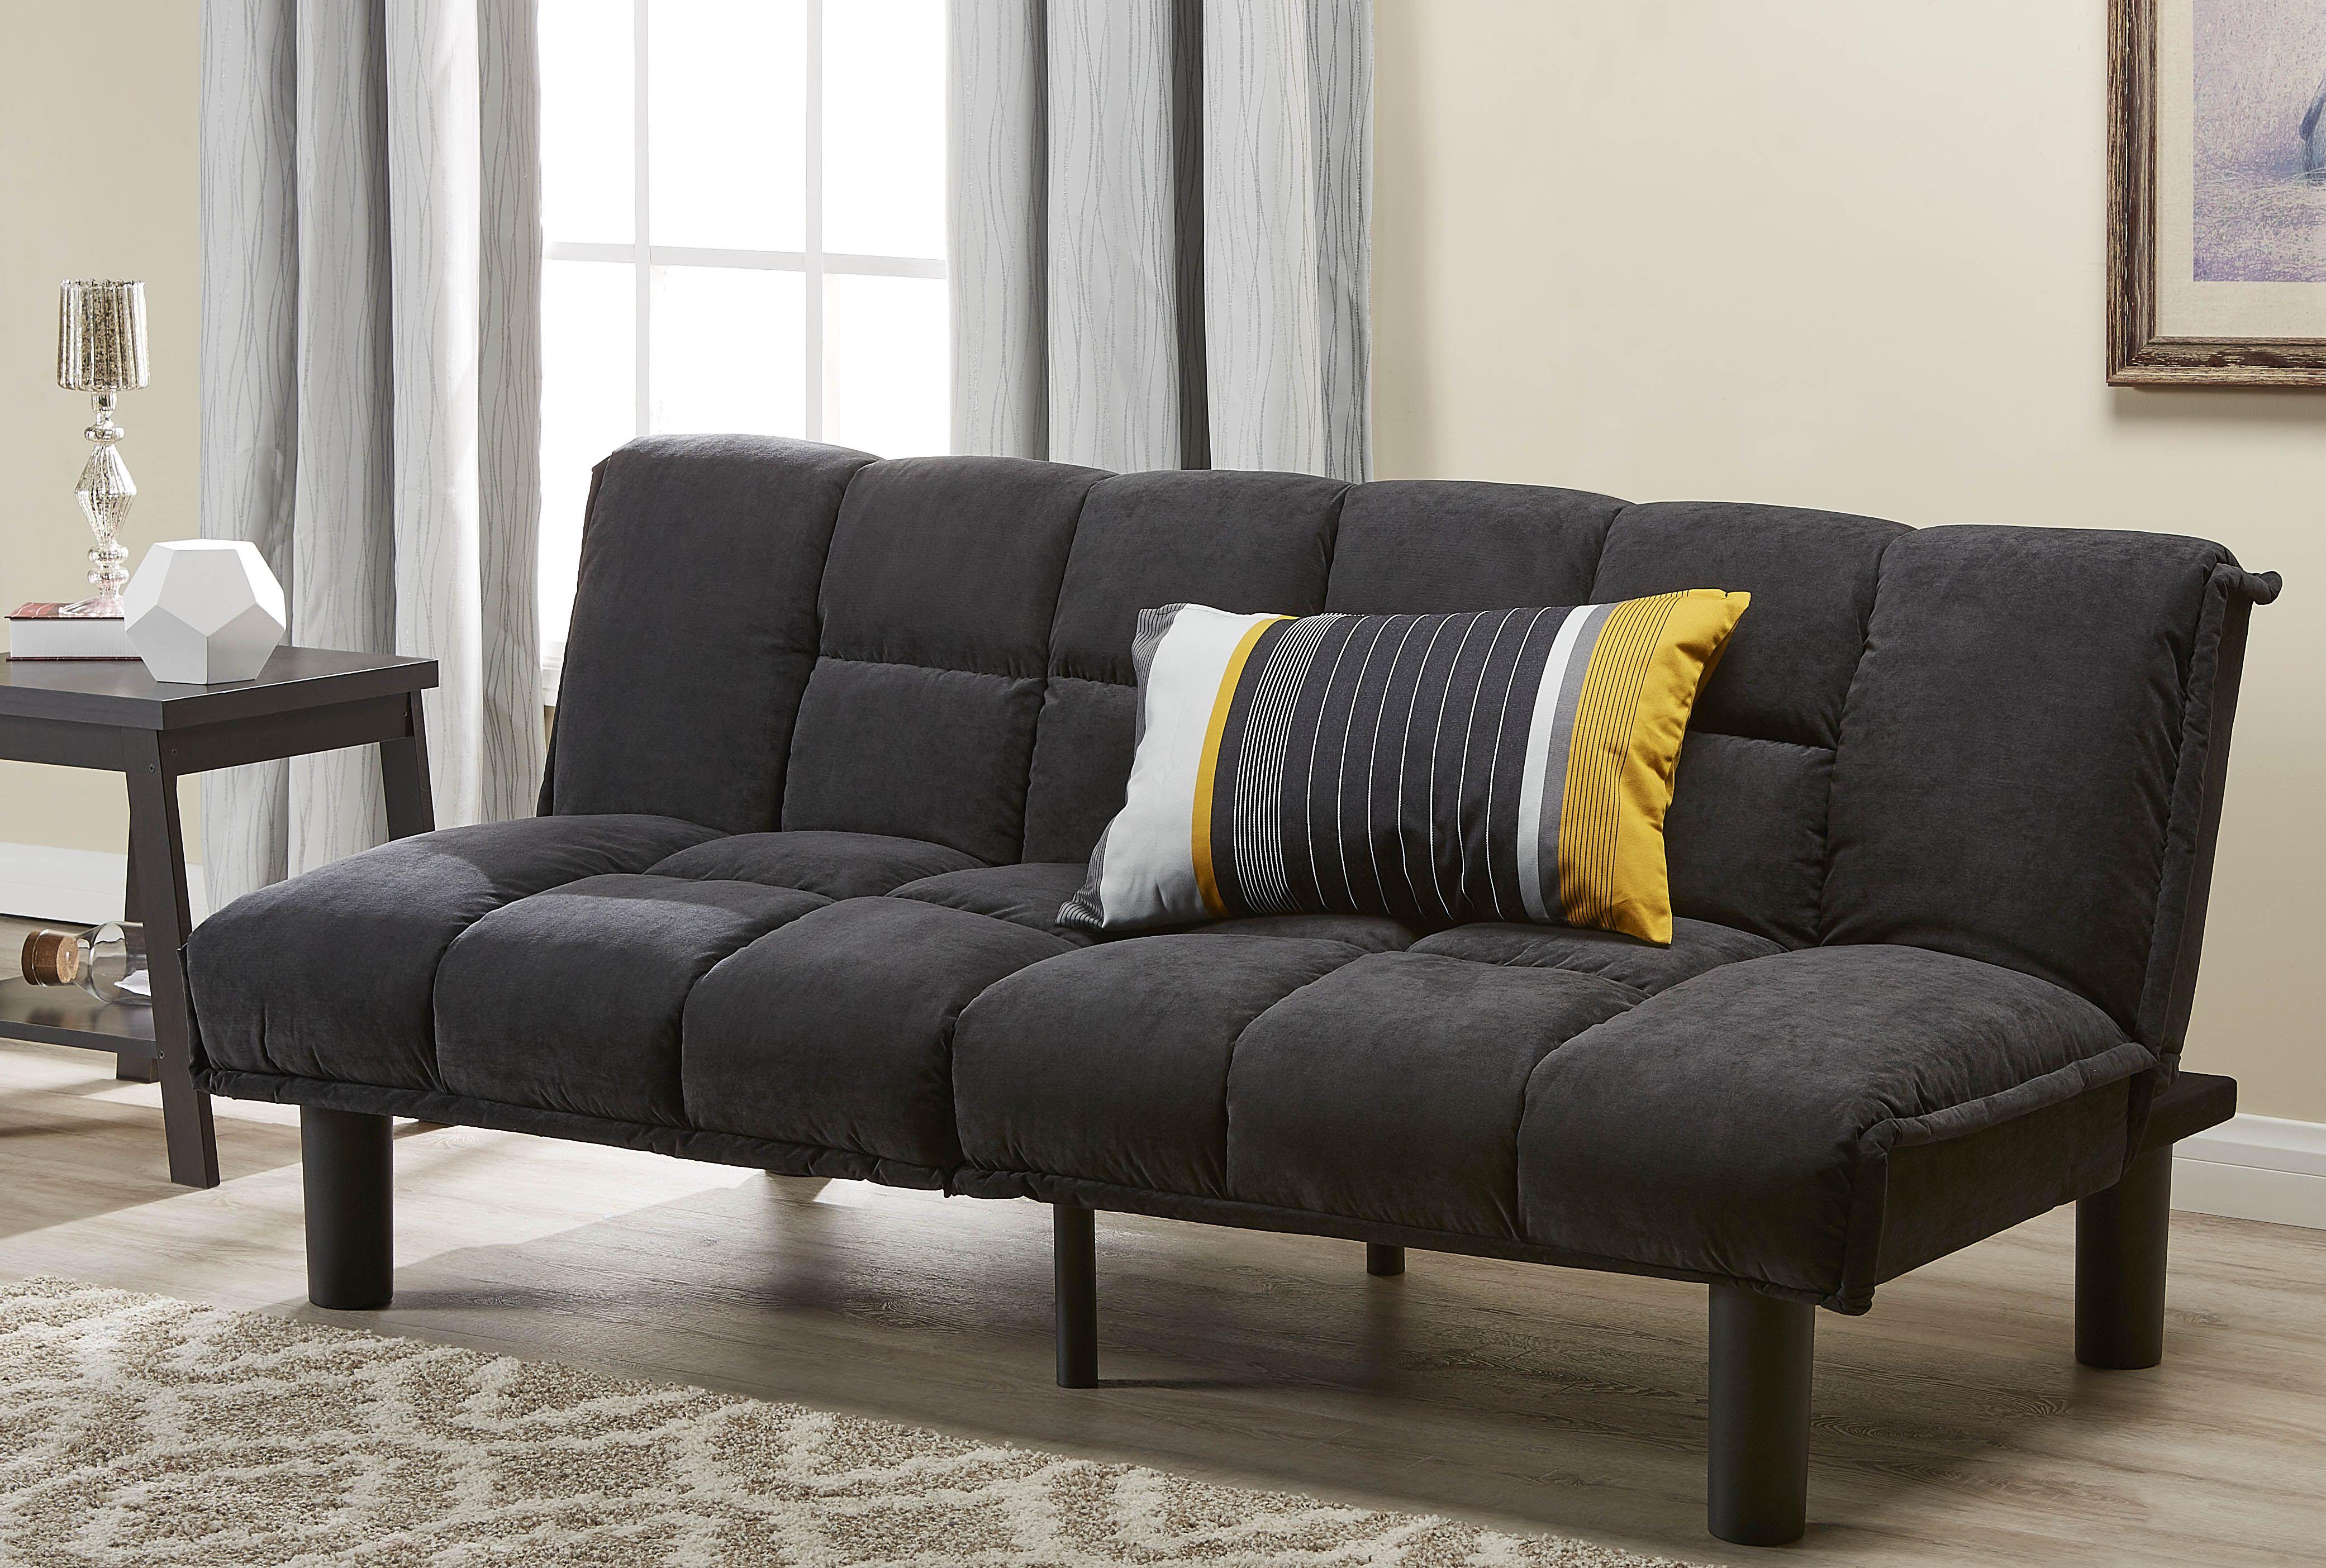 Home (With images) Futon, Futon sofa bed, Futon sofa